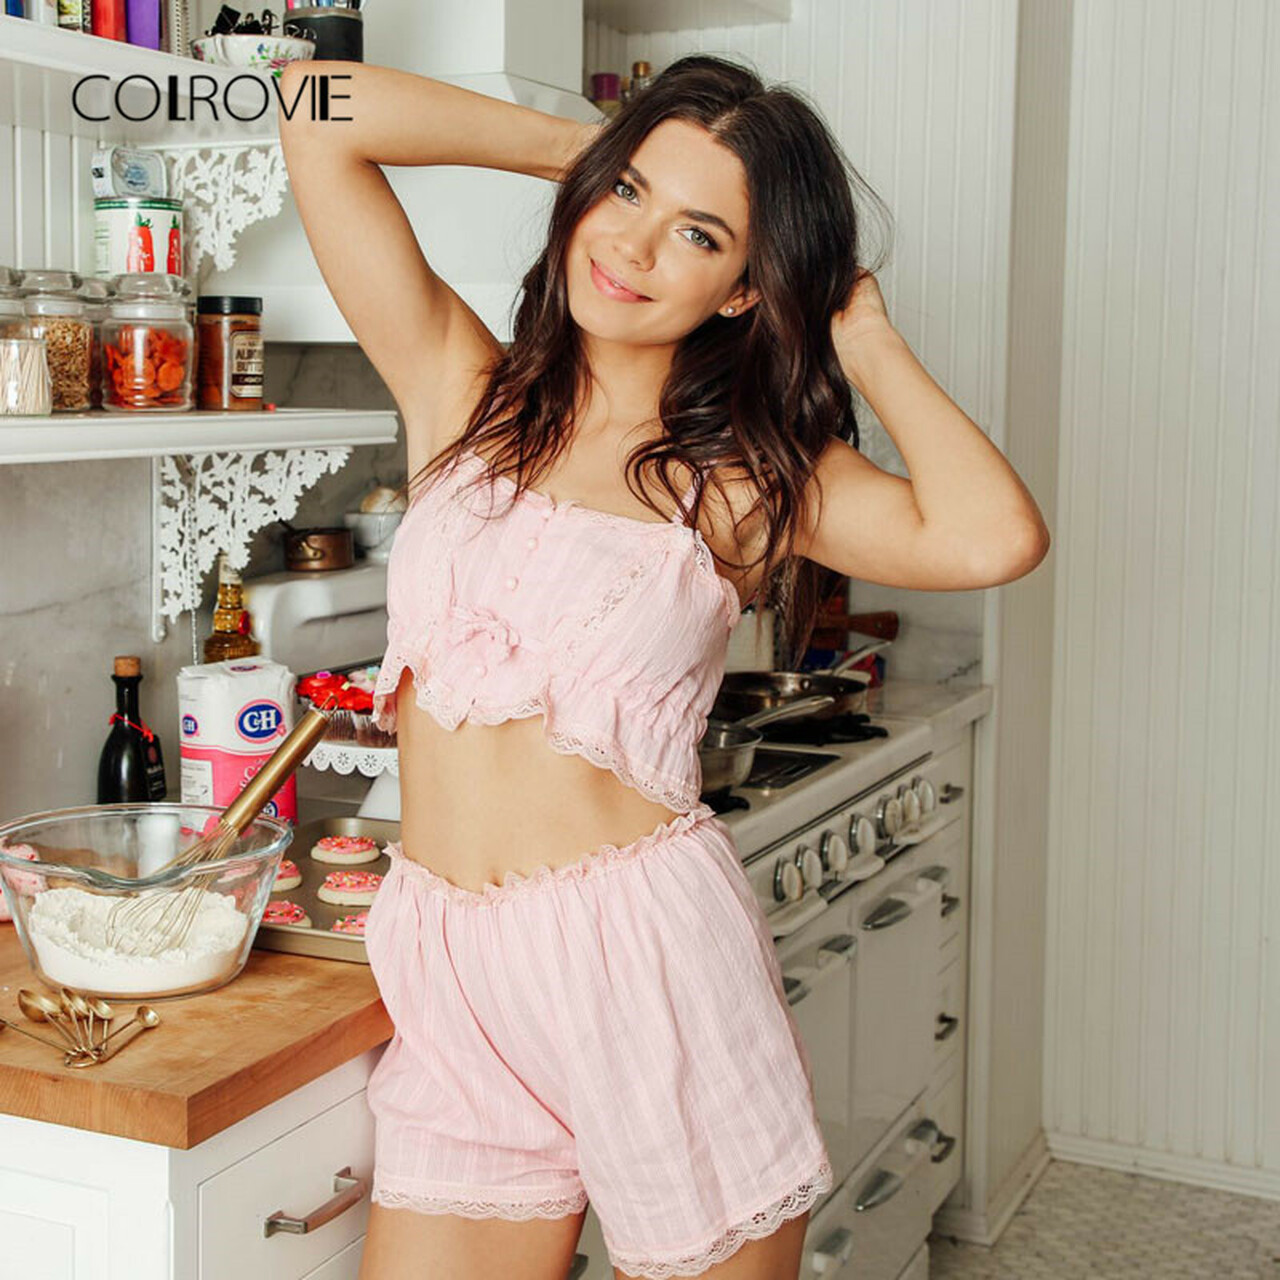 7ddcc2448b ... COLROVIE 2017 Contrast Lace Cami With Shorts Pajama Set Women Pink  Spaghetti Strap Sleeveless Drawstring Waist